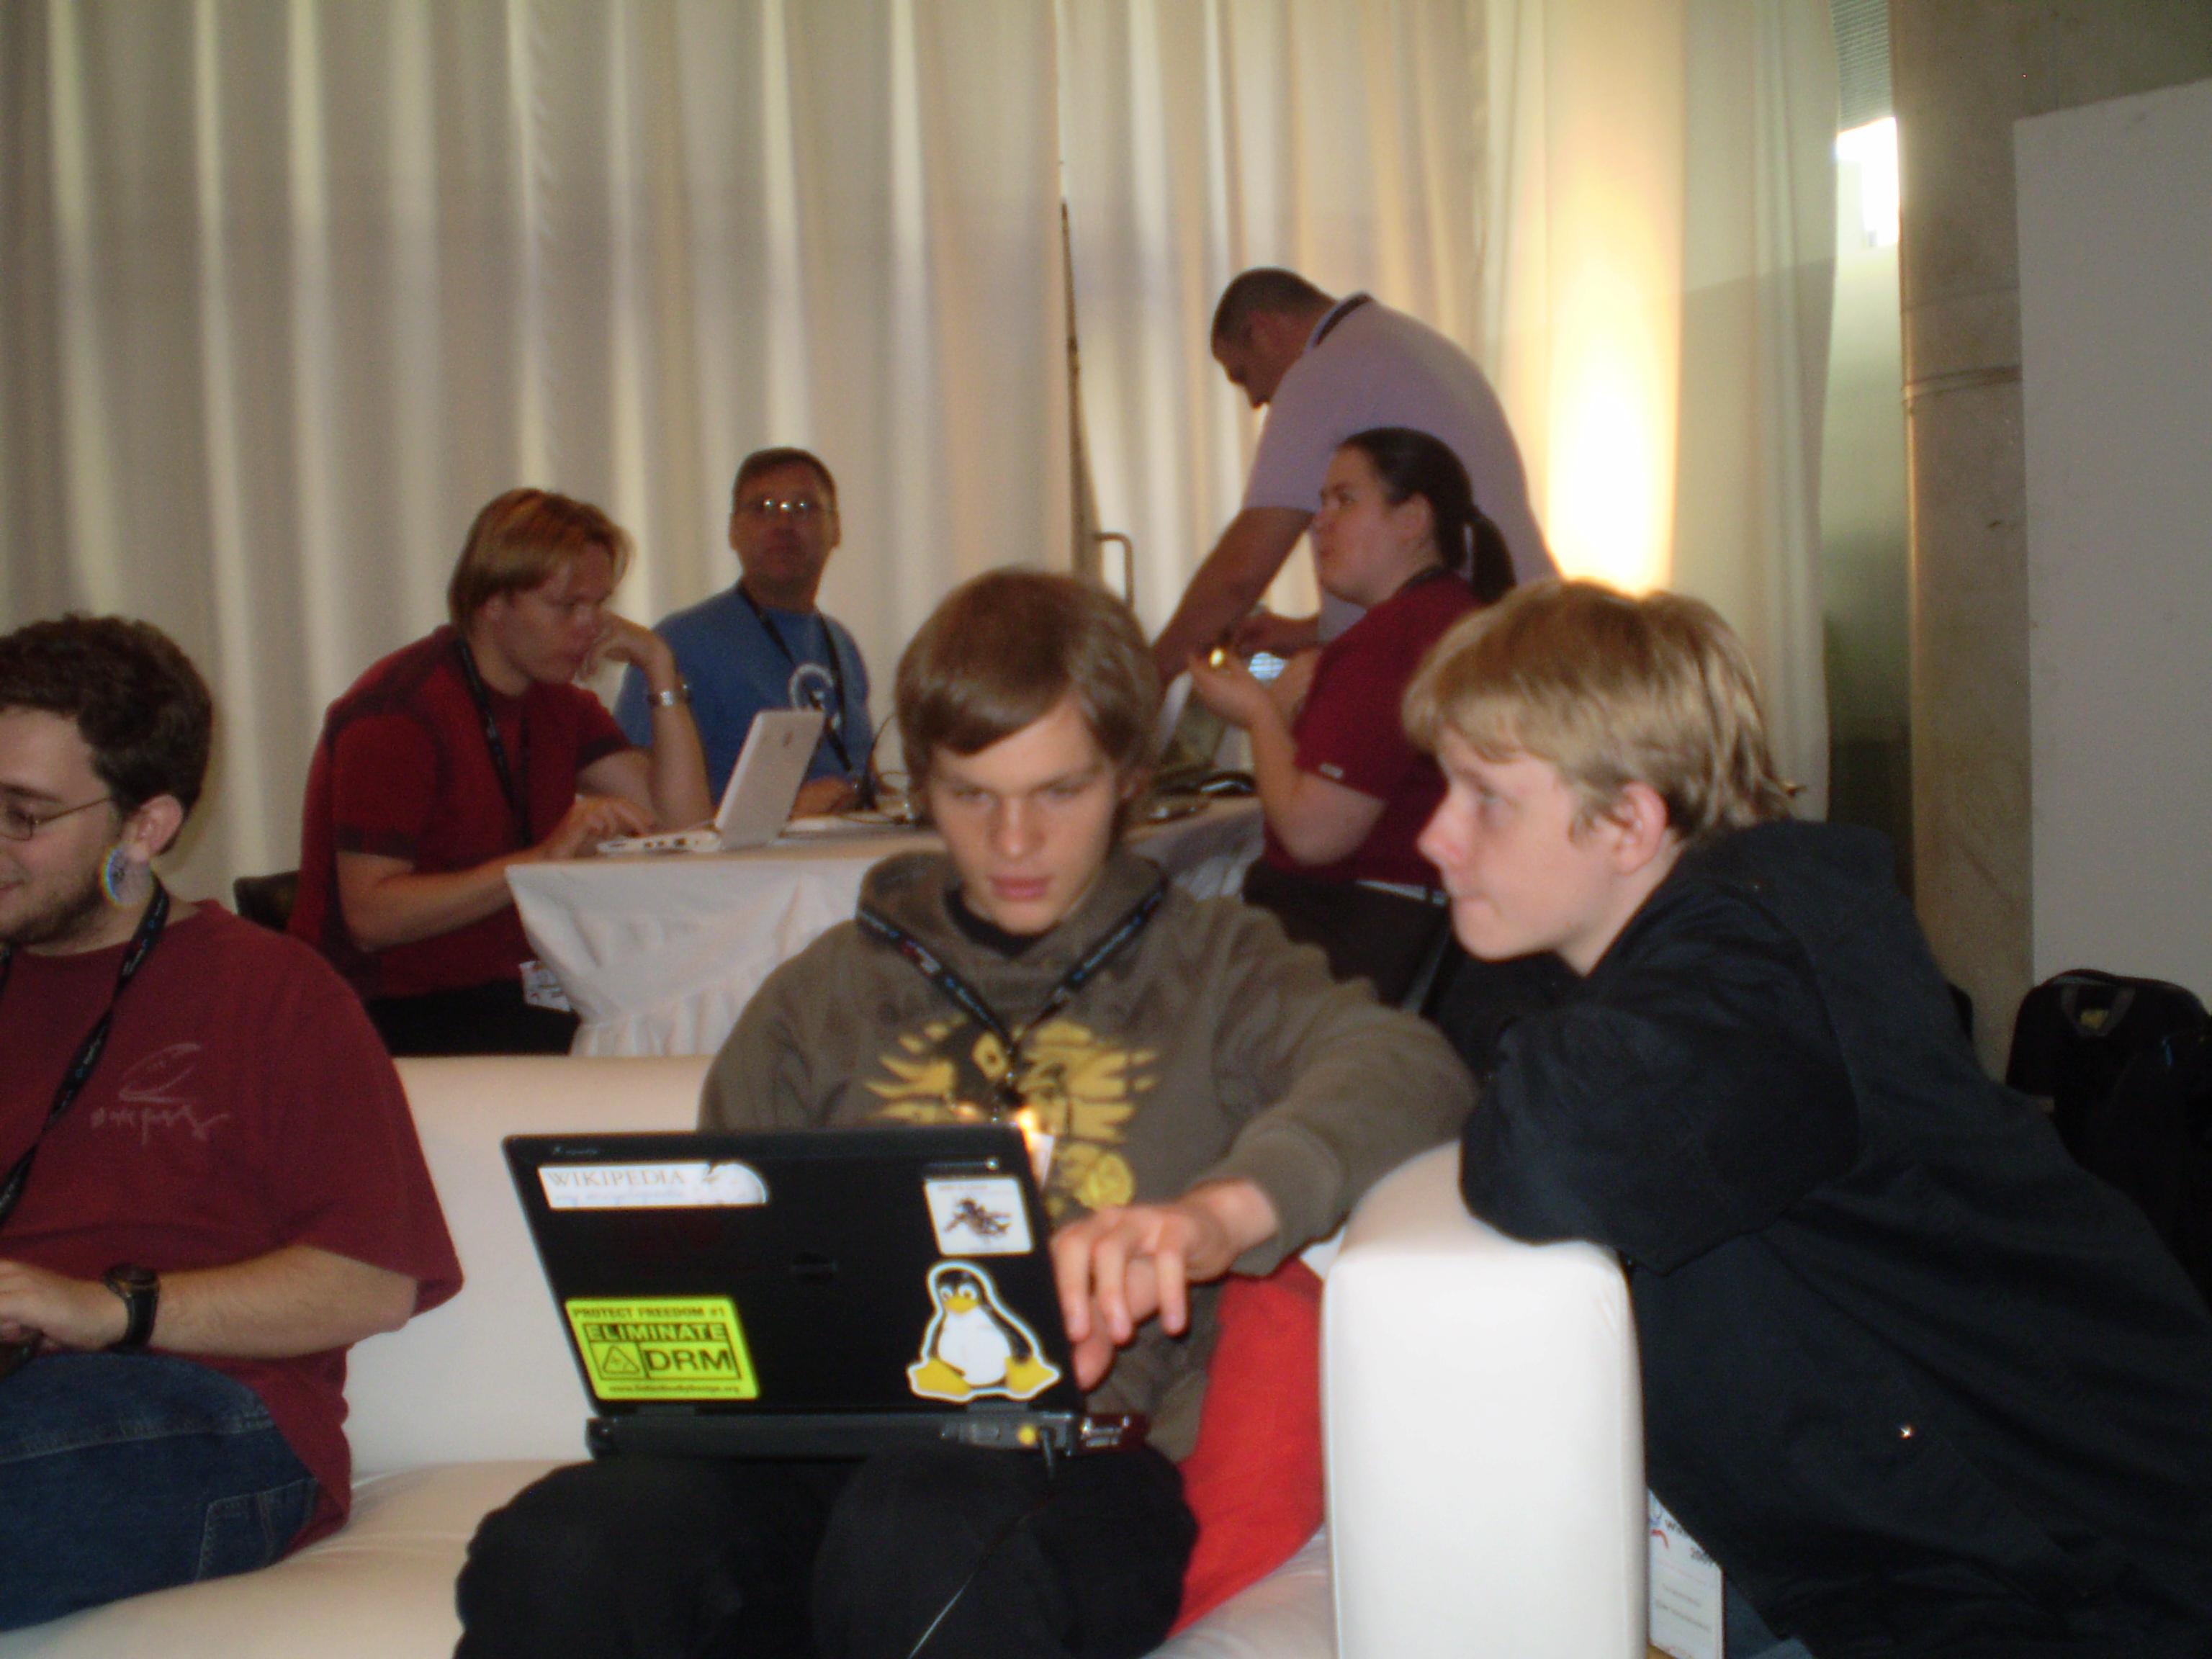 wikipedians at work